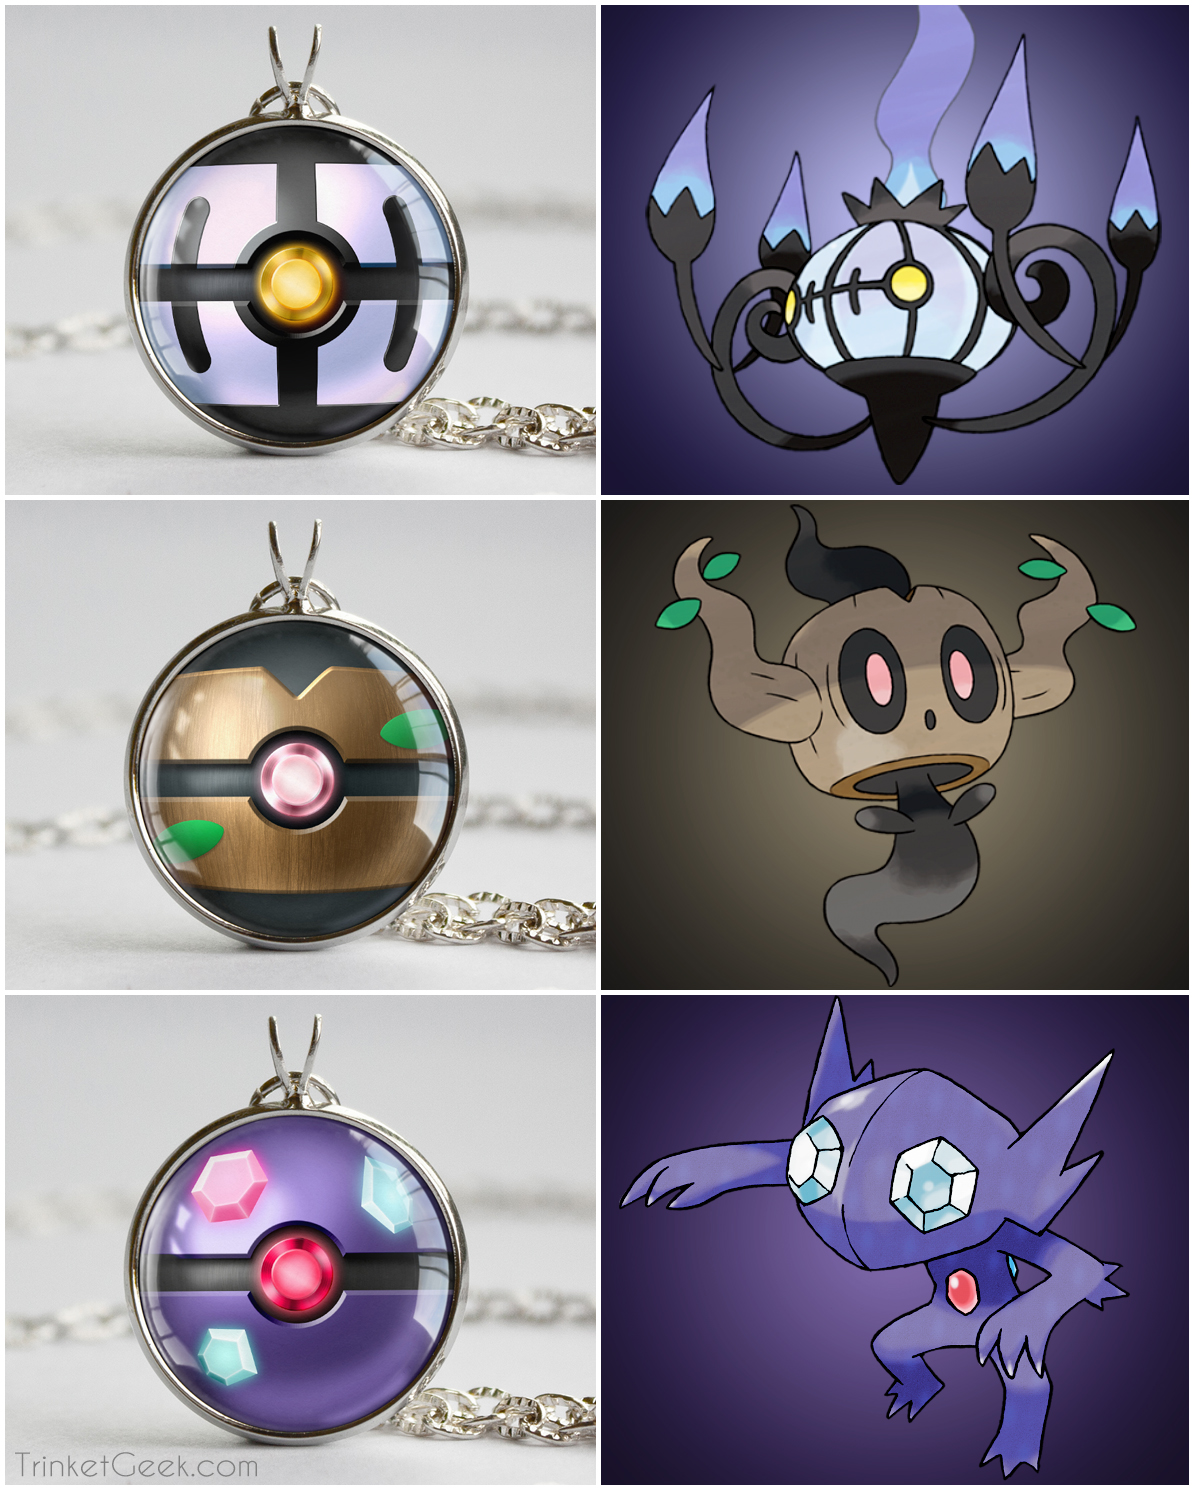 Pokeball clipart shiny Pokeball pokemon pendants Pokeball starter